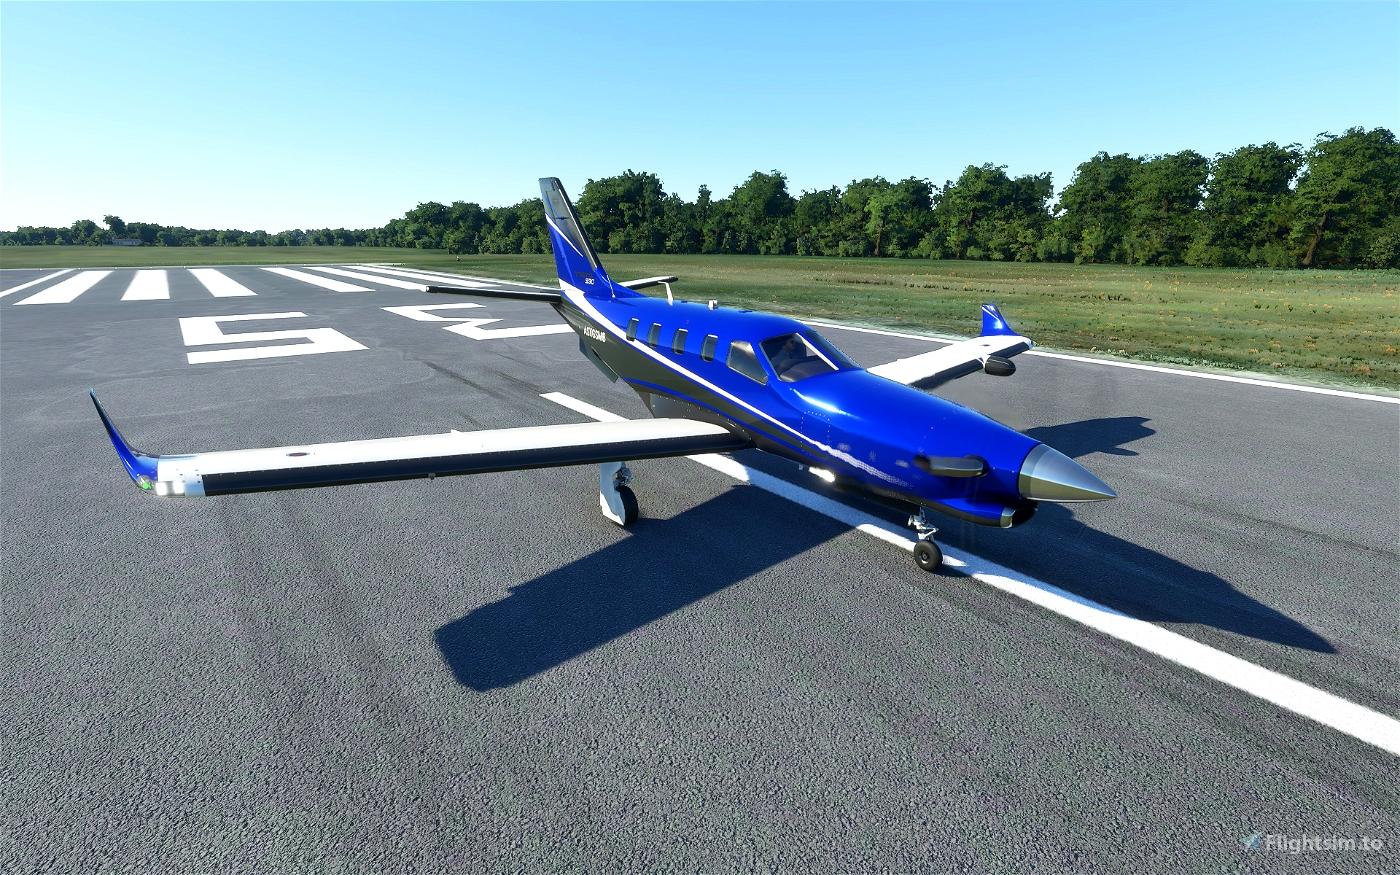 Daher TBM 930 Metallic Paint (6 colors) Flight Simulator 2020